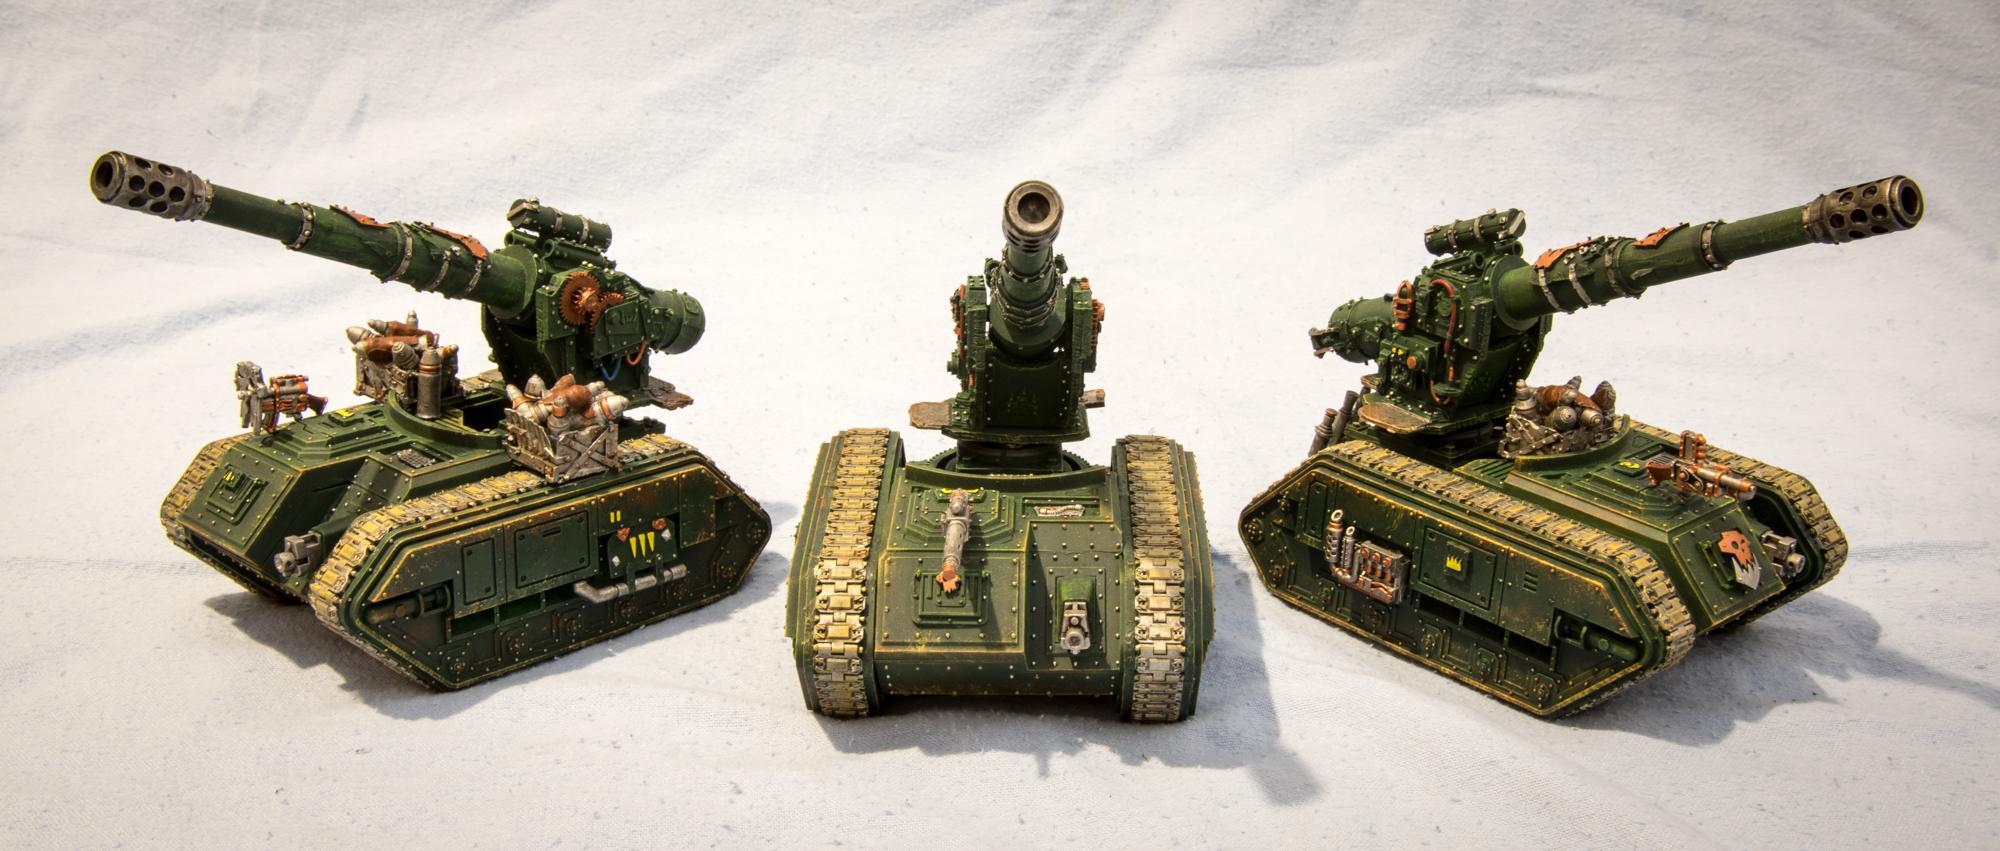 Basilisk, Battery, Conversion, Imperial Guard